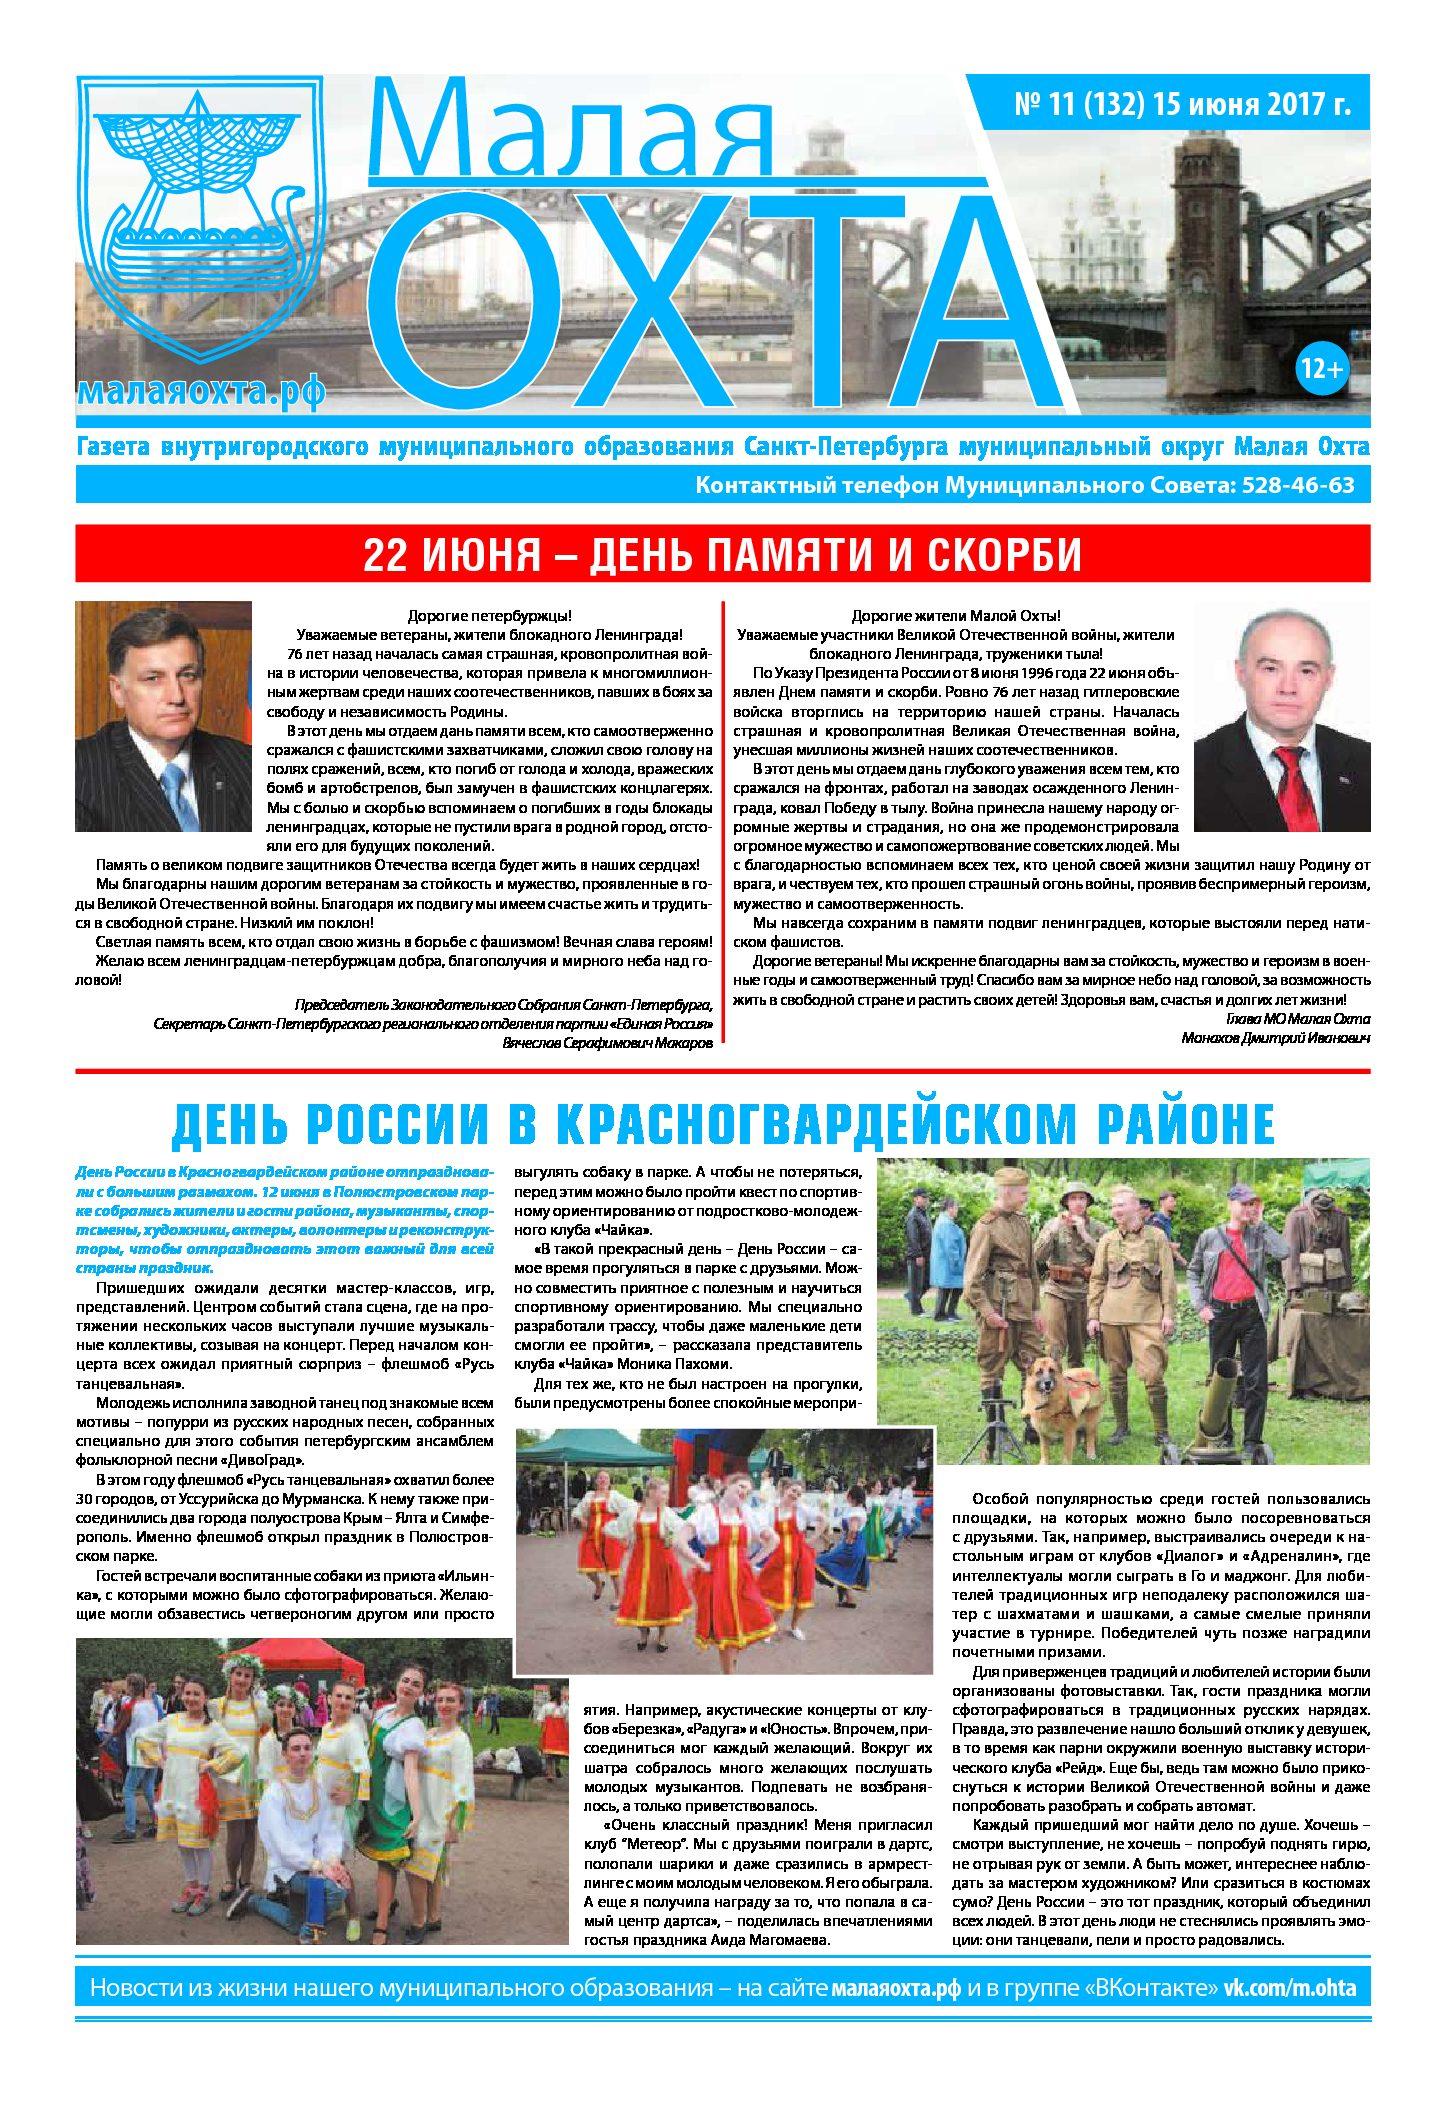 Газета № 11 2017